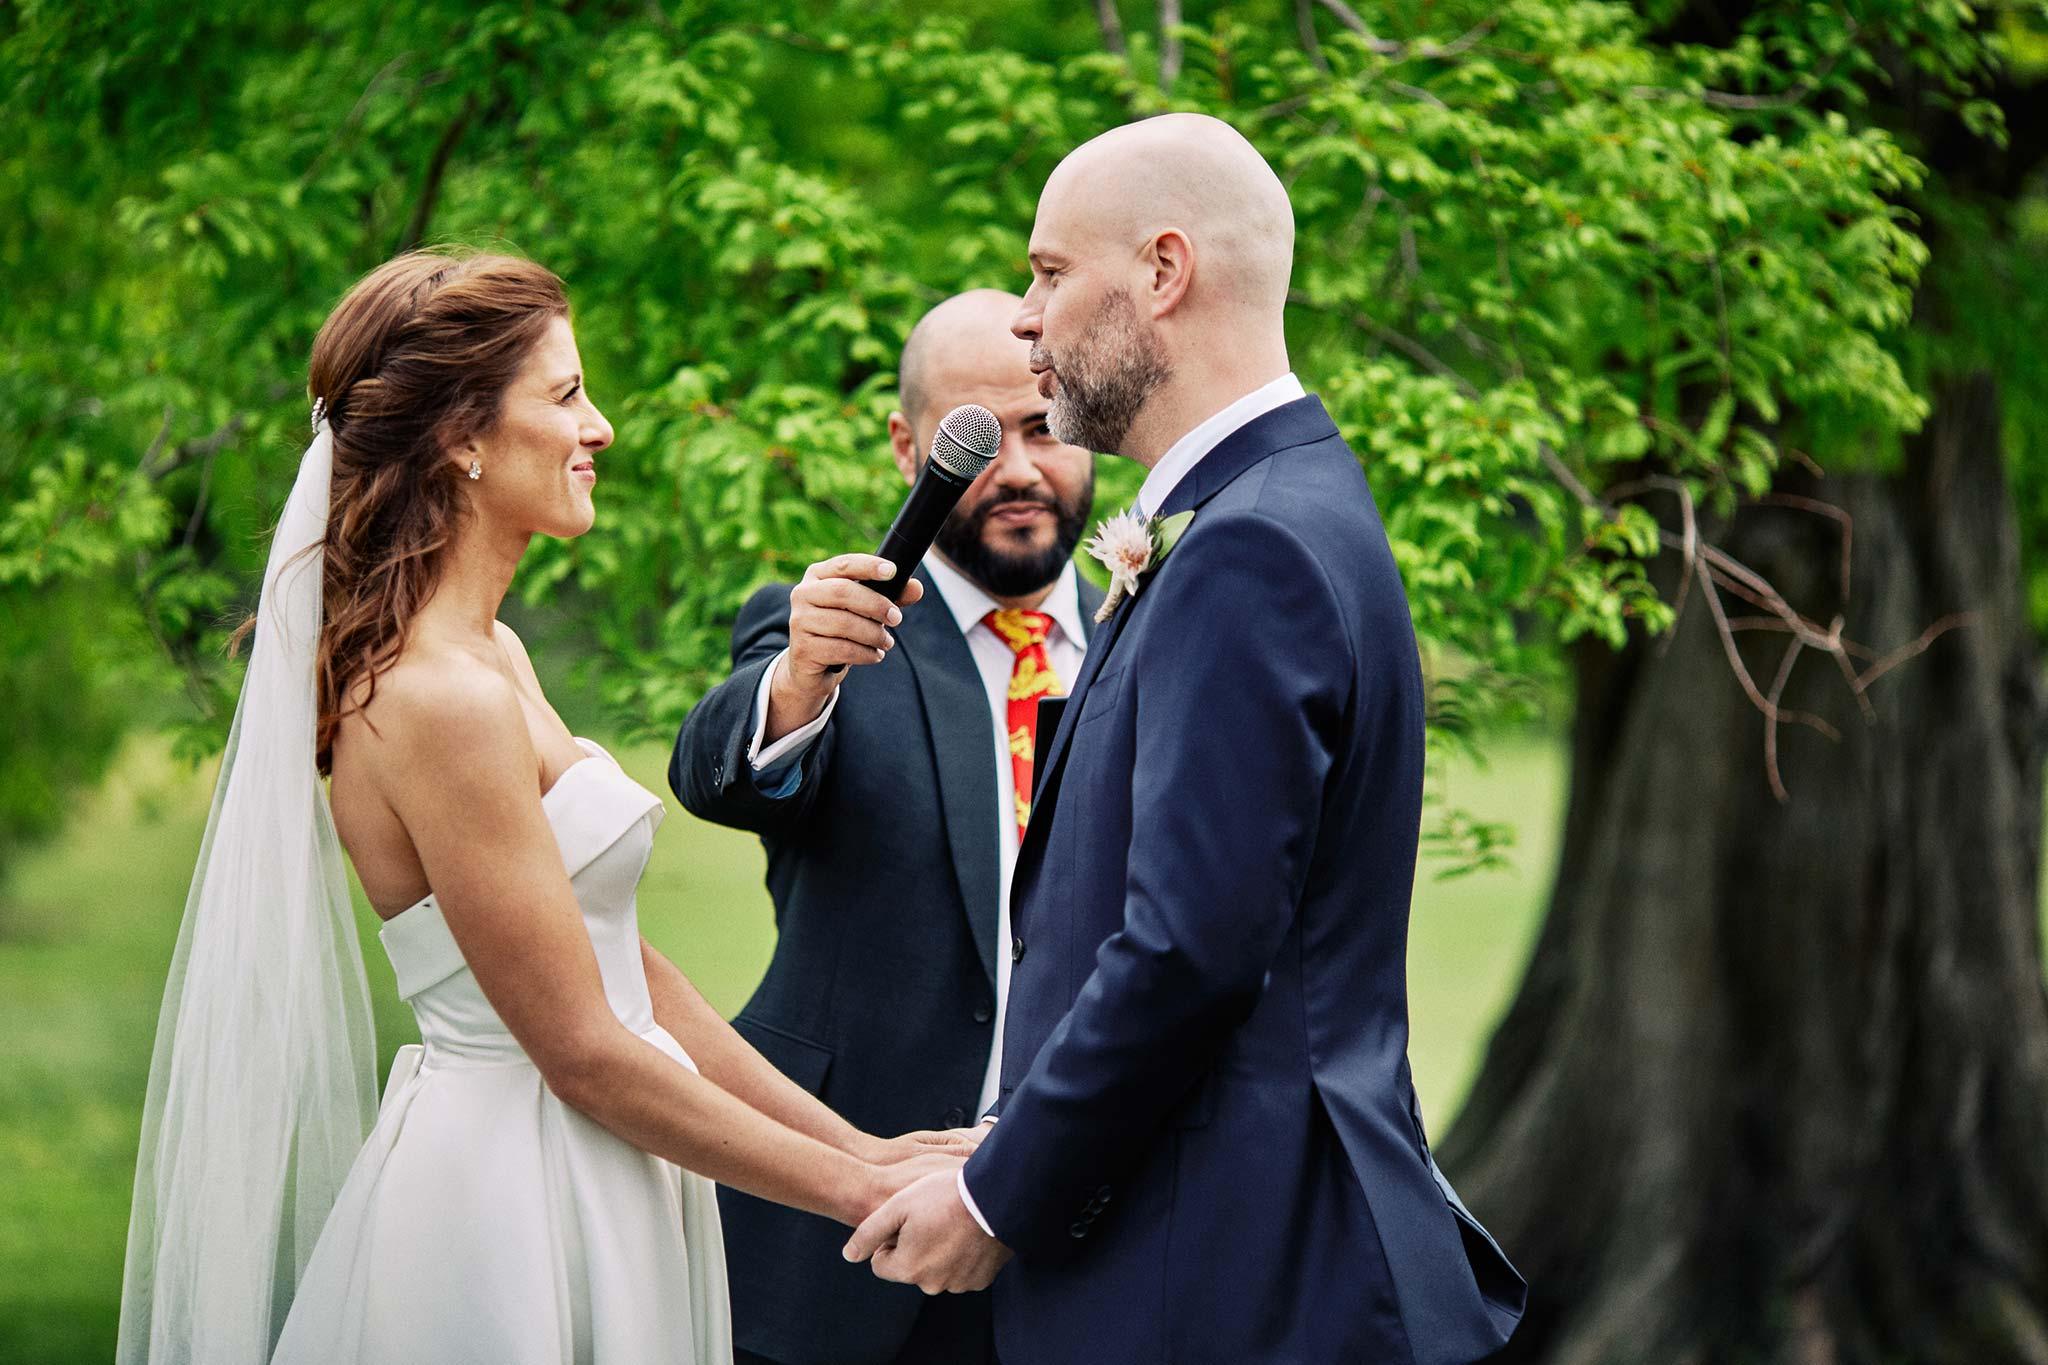 Melbourne Royal Botanical Garden Wedding Ceremony vow